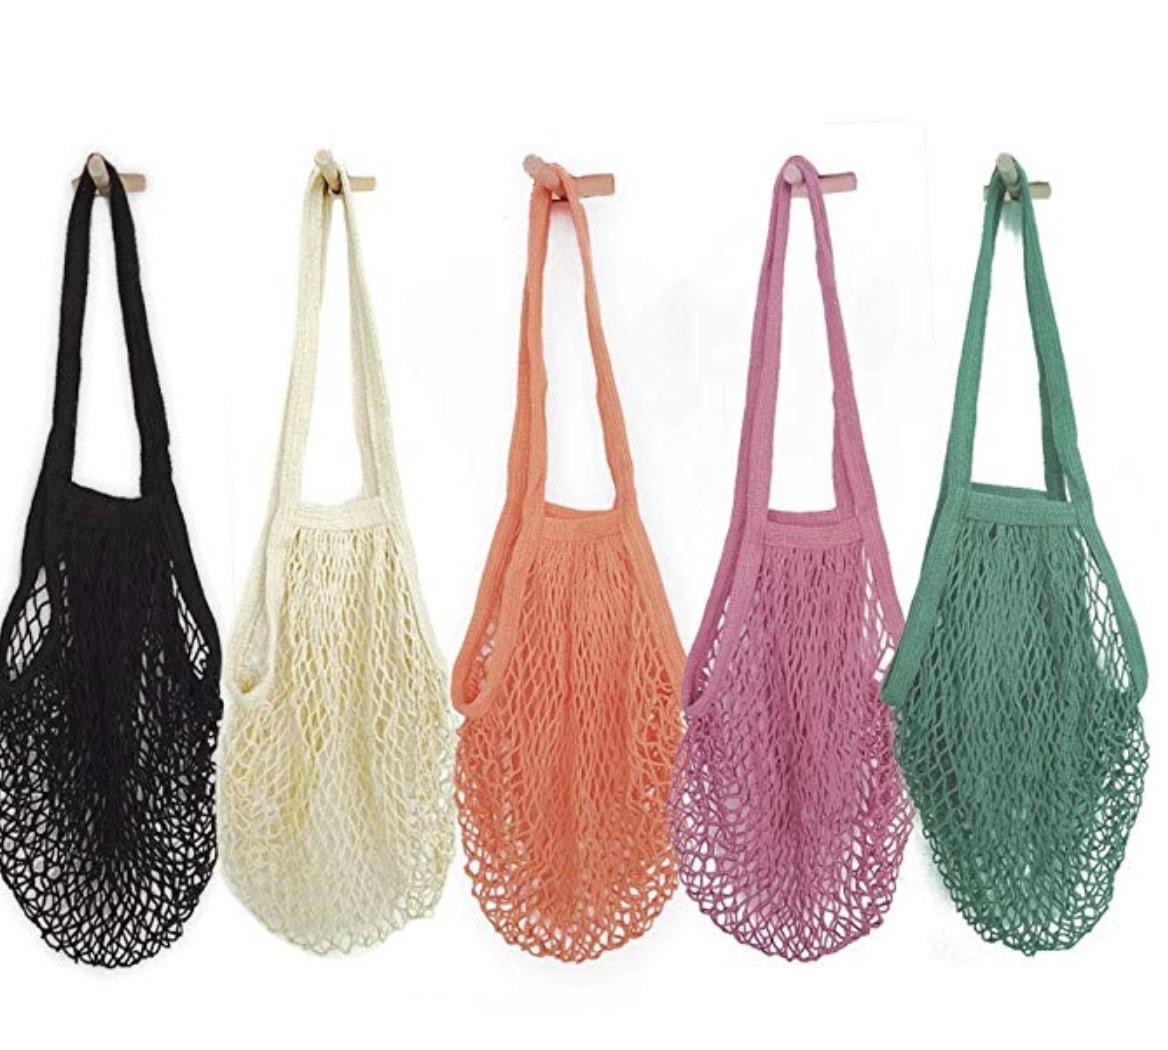 COLOURFUL MESH SHOPPING BAGS -